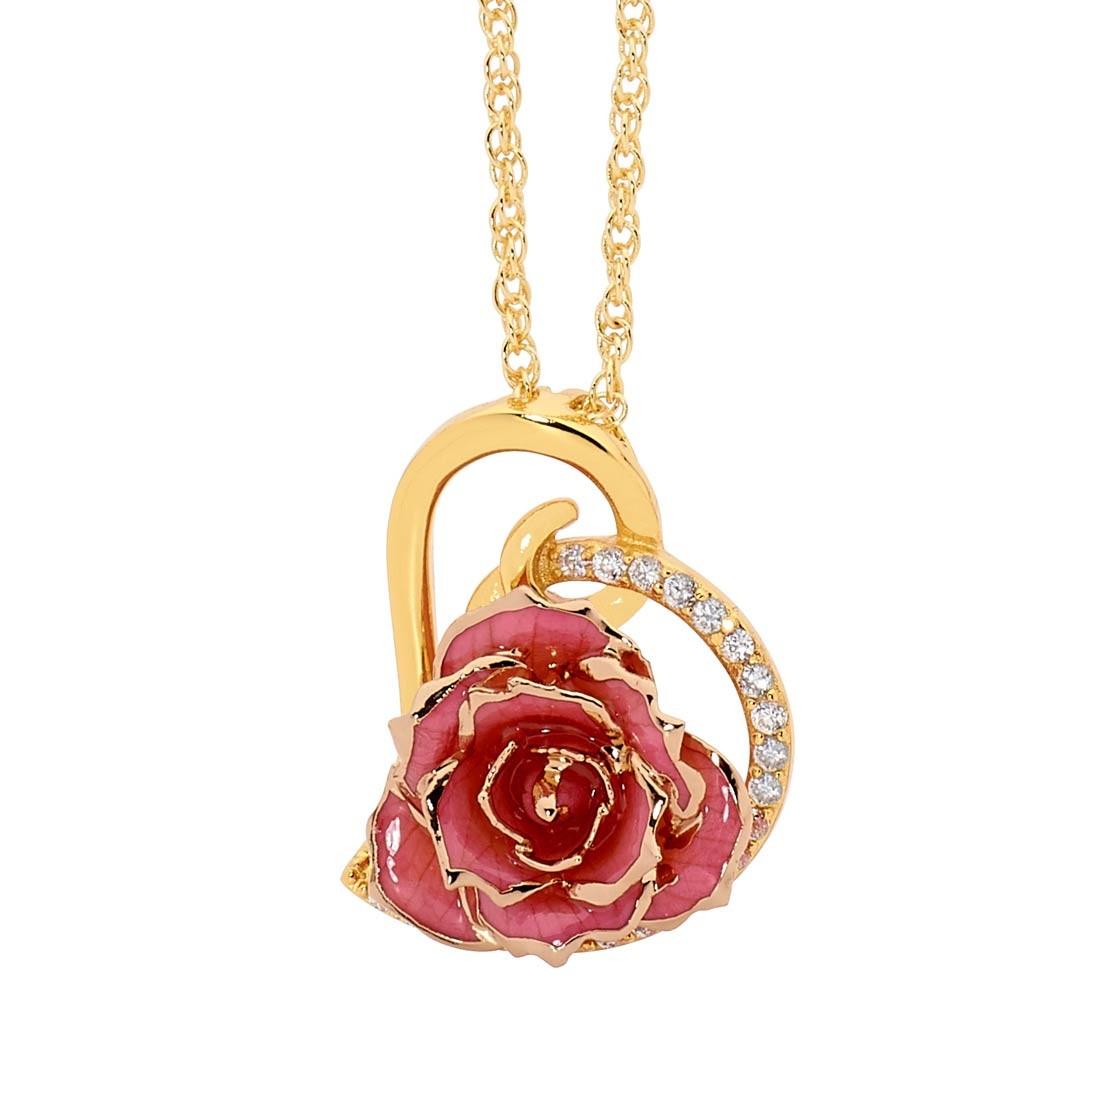 Glazed rose heart pendant 24k gold pink glazed rose heart pendant 24k gold audiocablefo